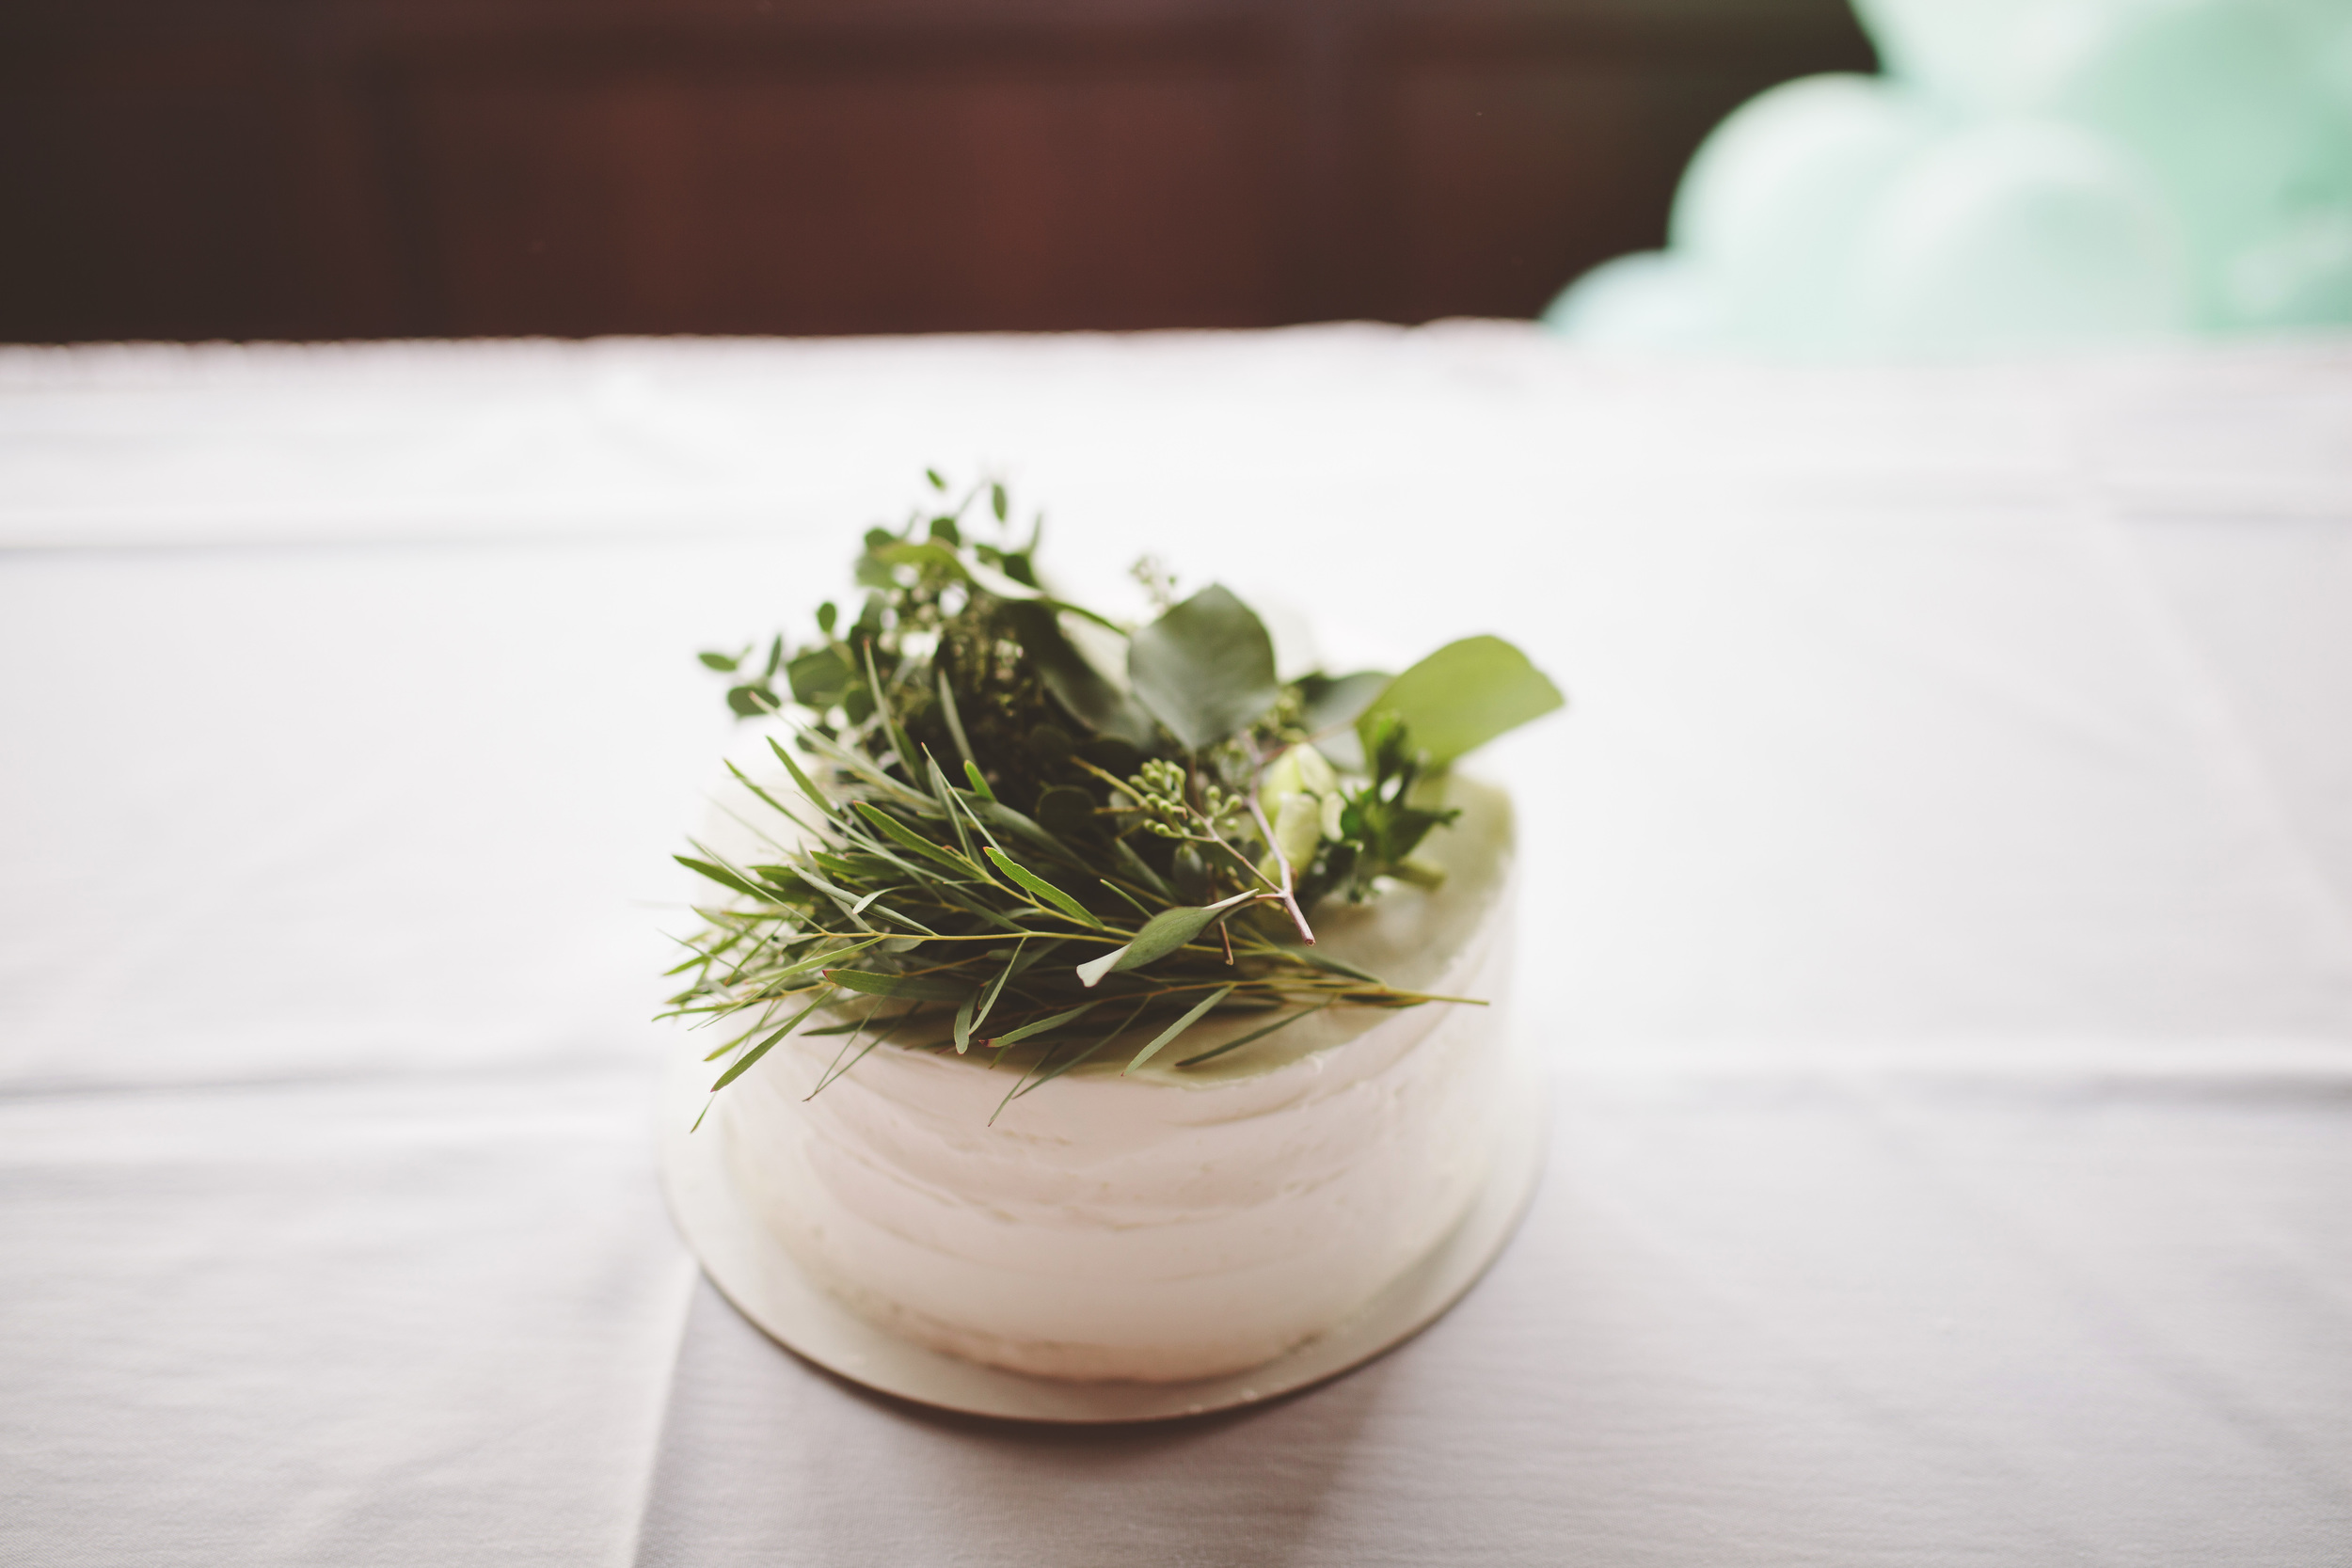 the-bees-knees-floral-design-studio-brainerd-mn-minnesota-florist-wedding-weddings-bride-greenery-vintage-decor-table-centerpiece-cake-flowers-greens